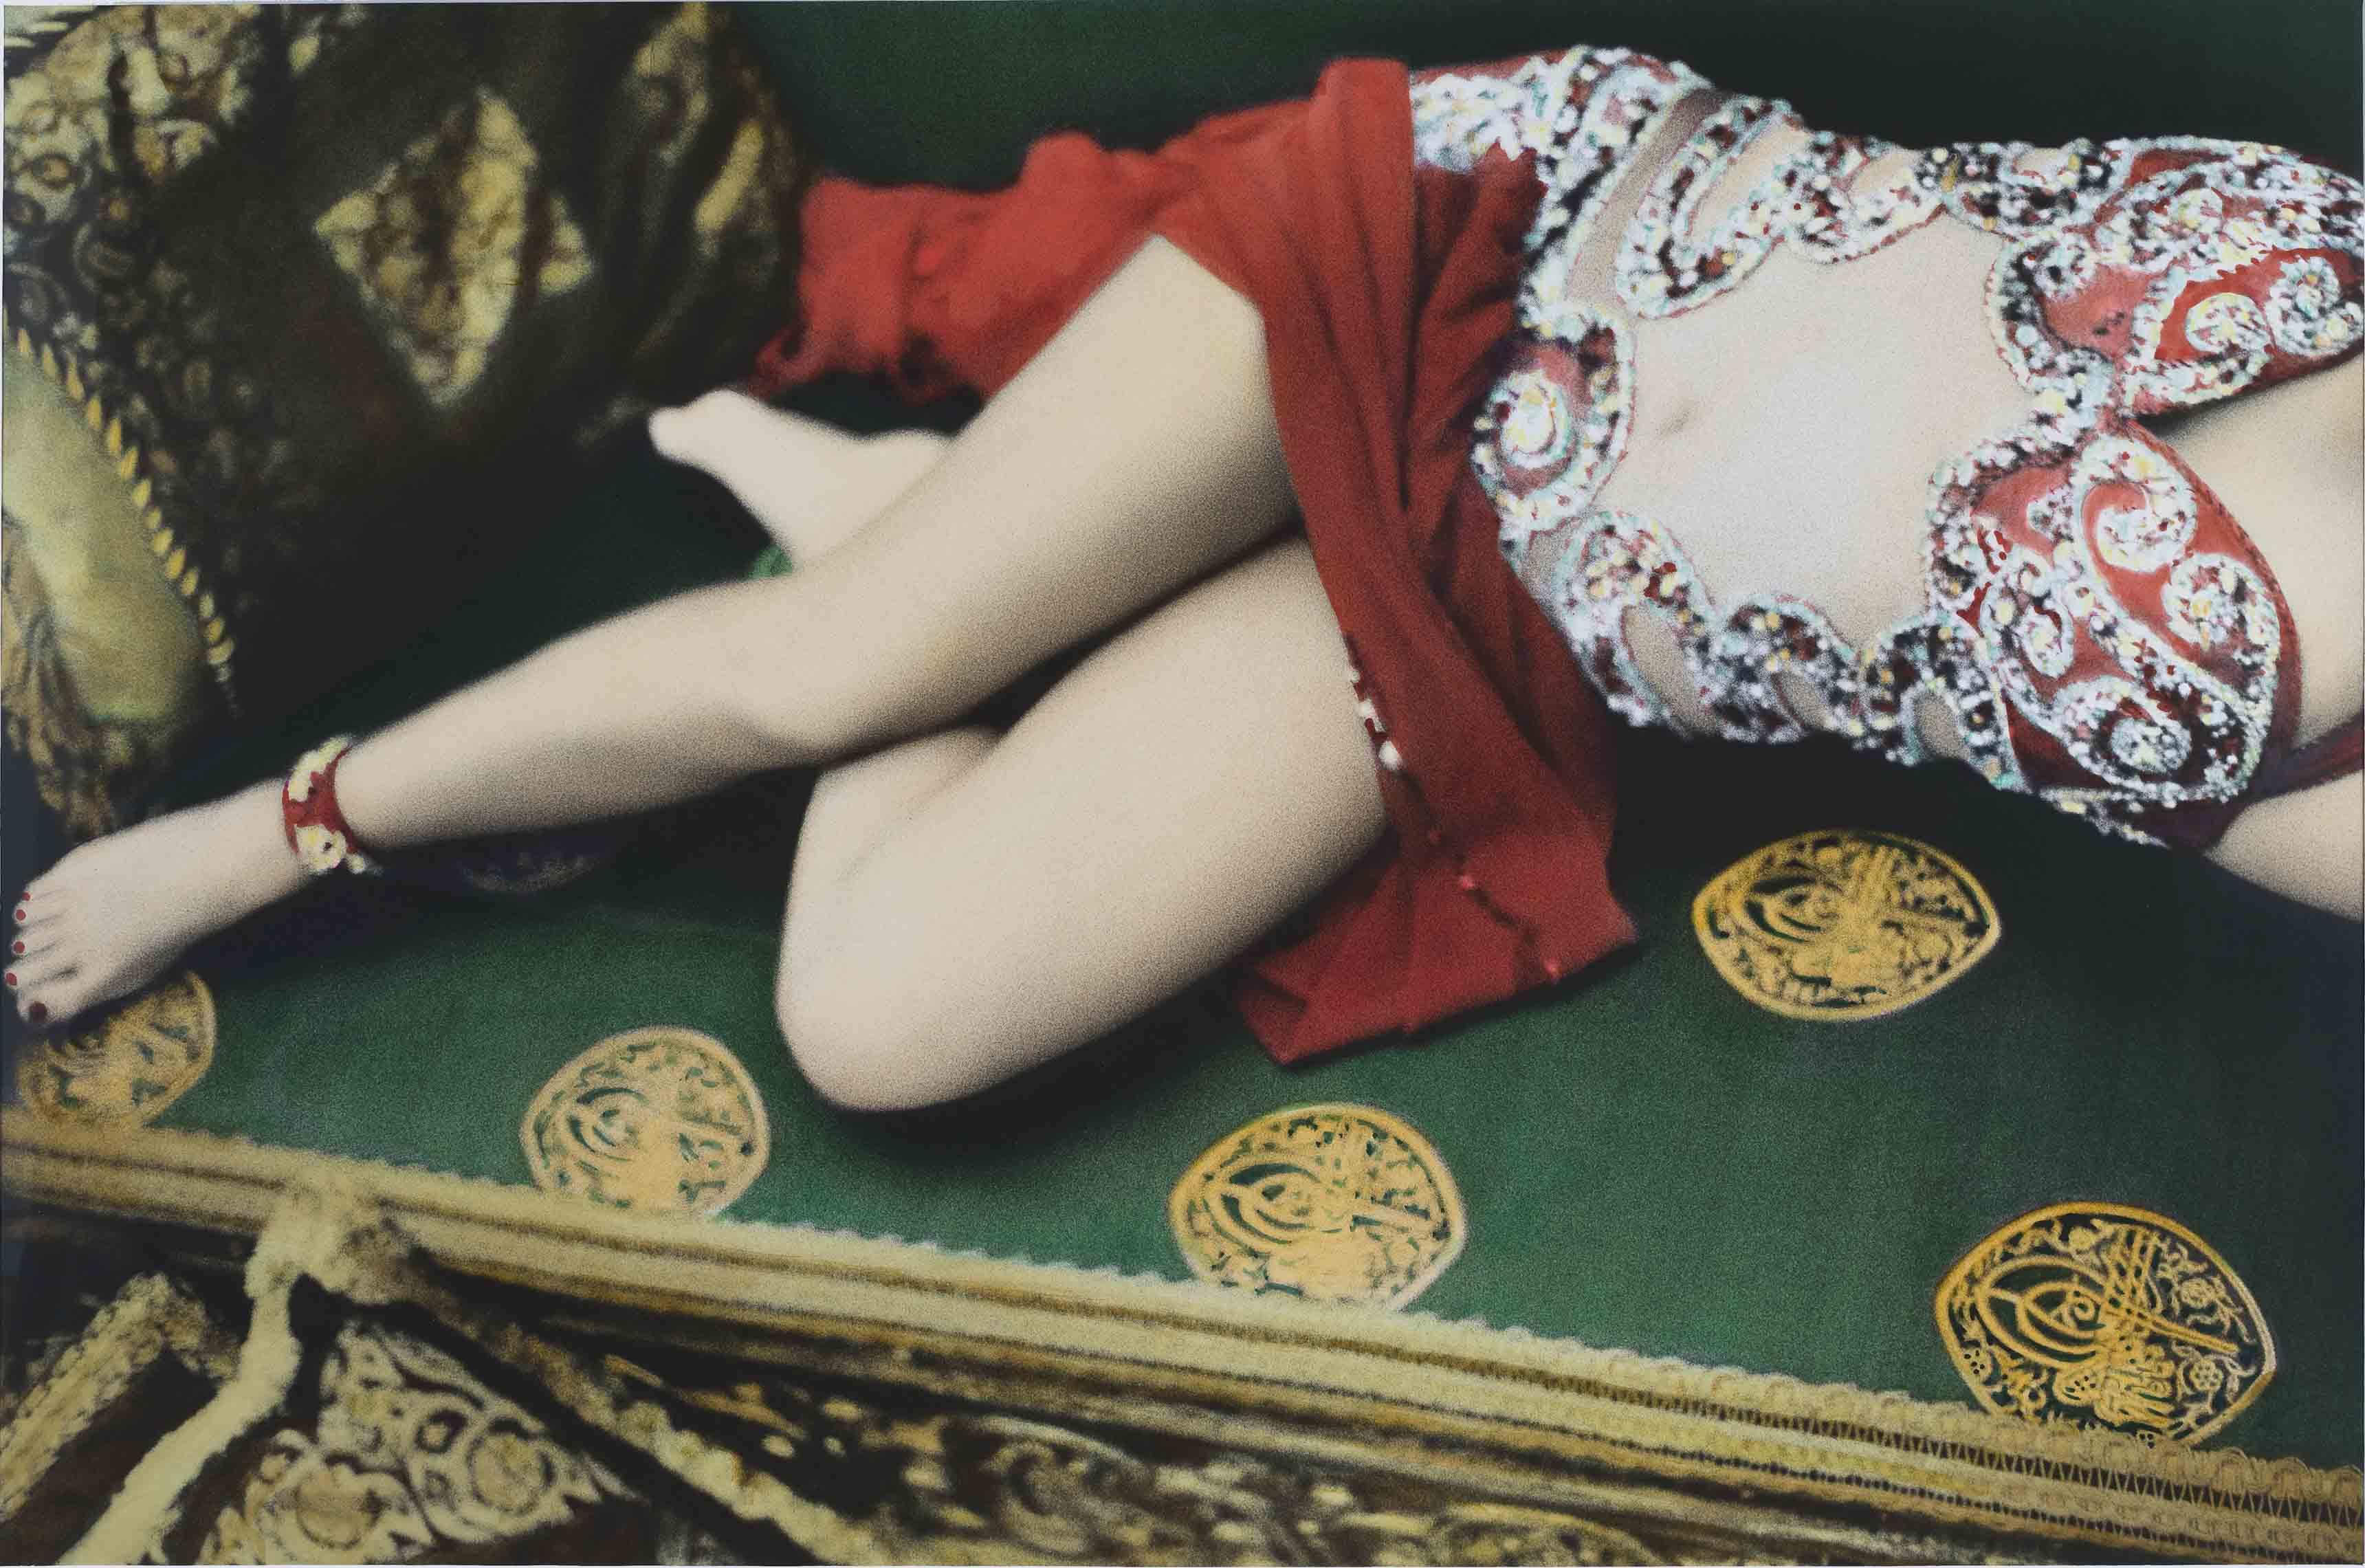 Natacha Atlas, Cairo 2000 © Youssef Nabil – Galerie Nathalie Obadia, Paris-Bruxelles